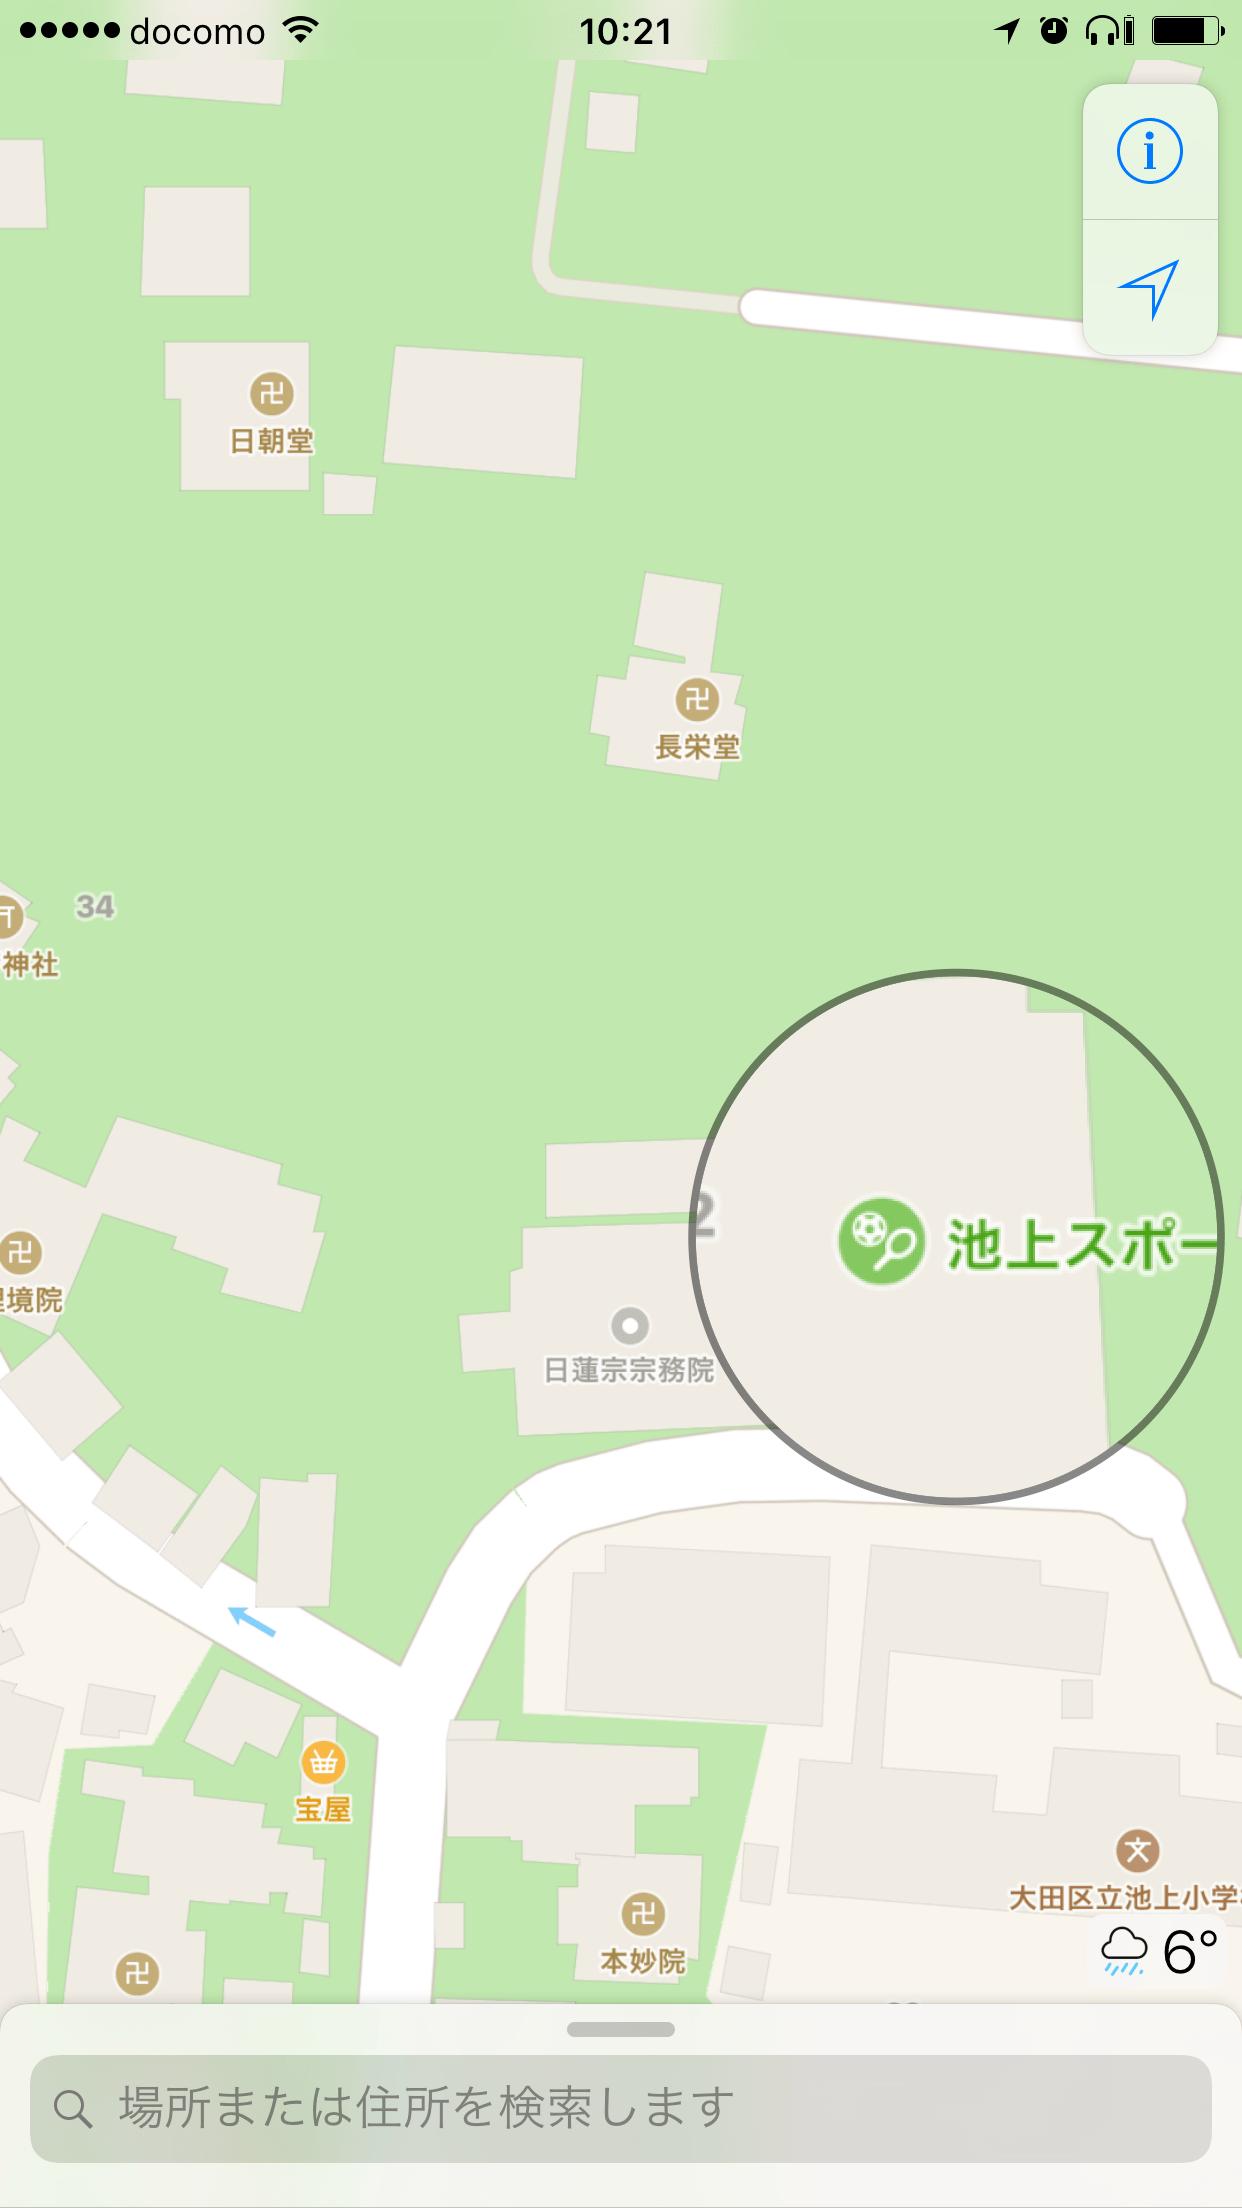 Apple Maps incorrectly displays Roshi Hall as Ikegami Sports Club